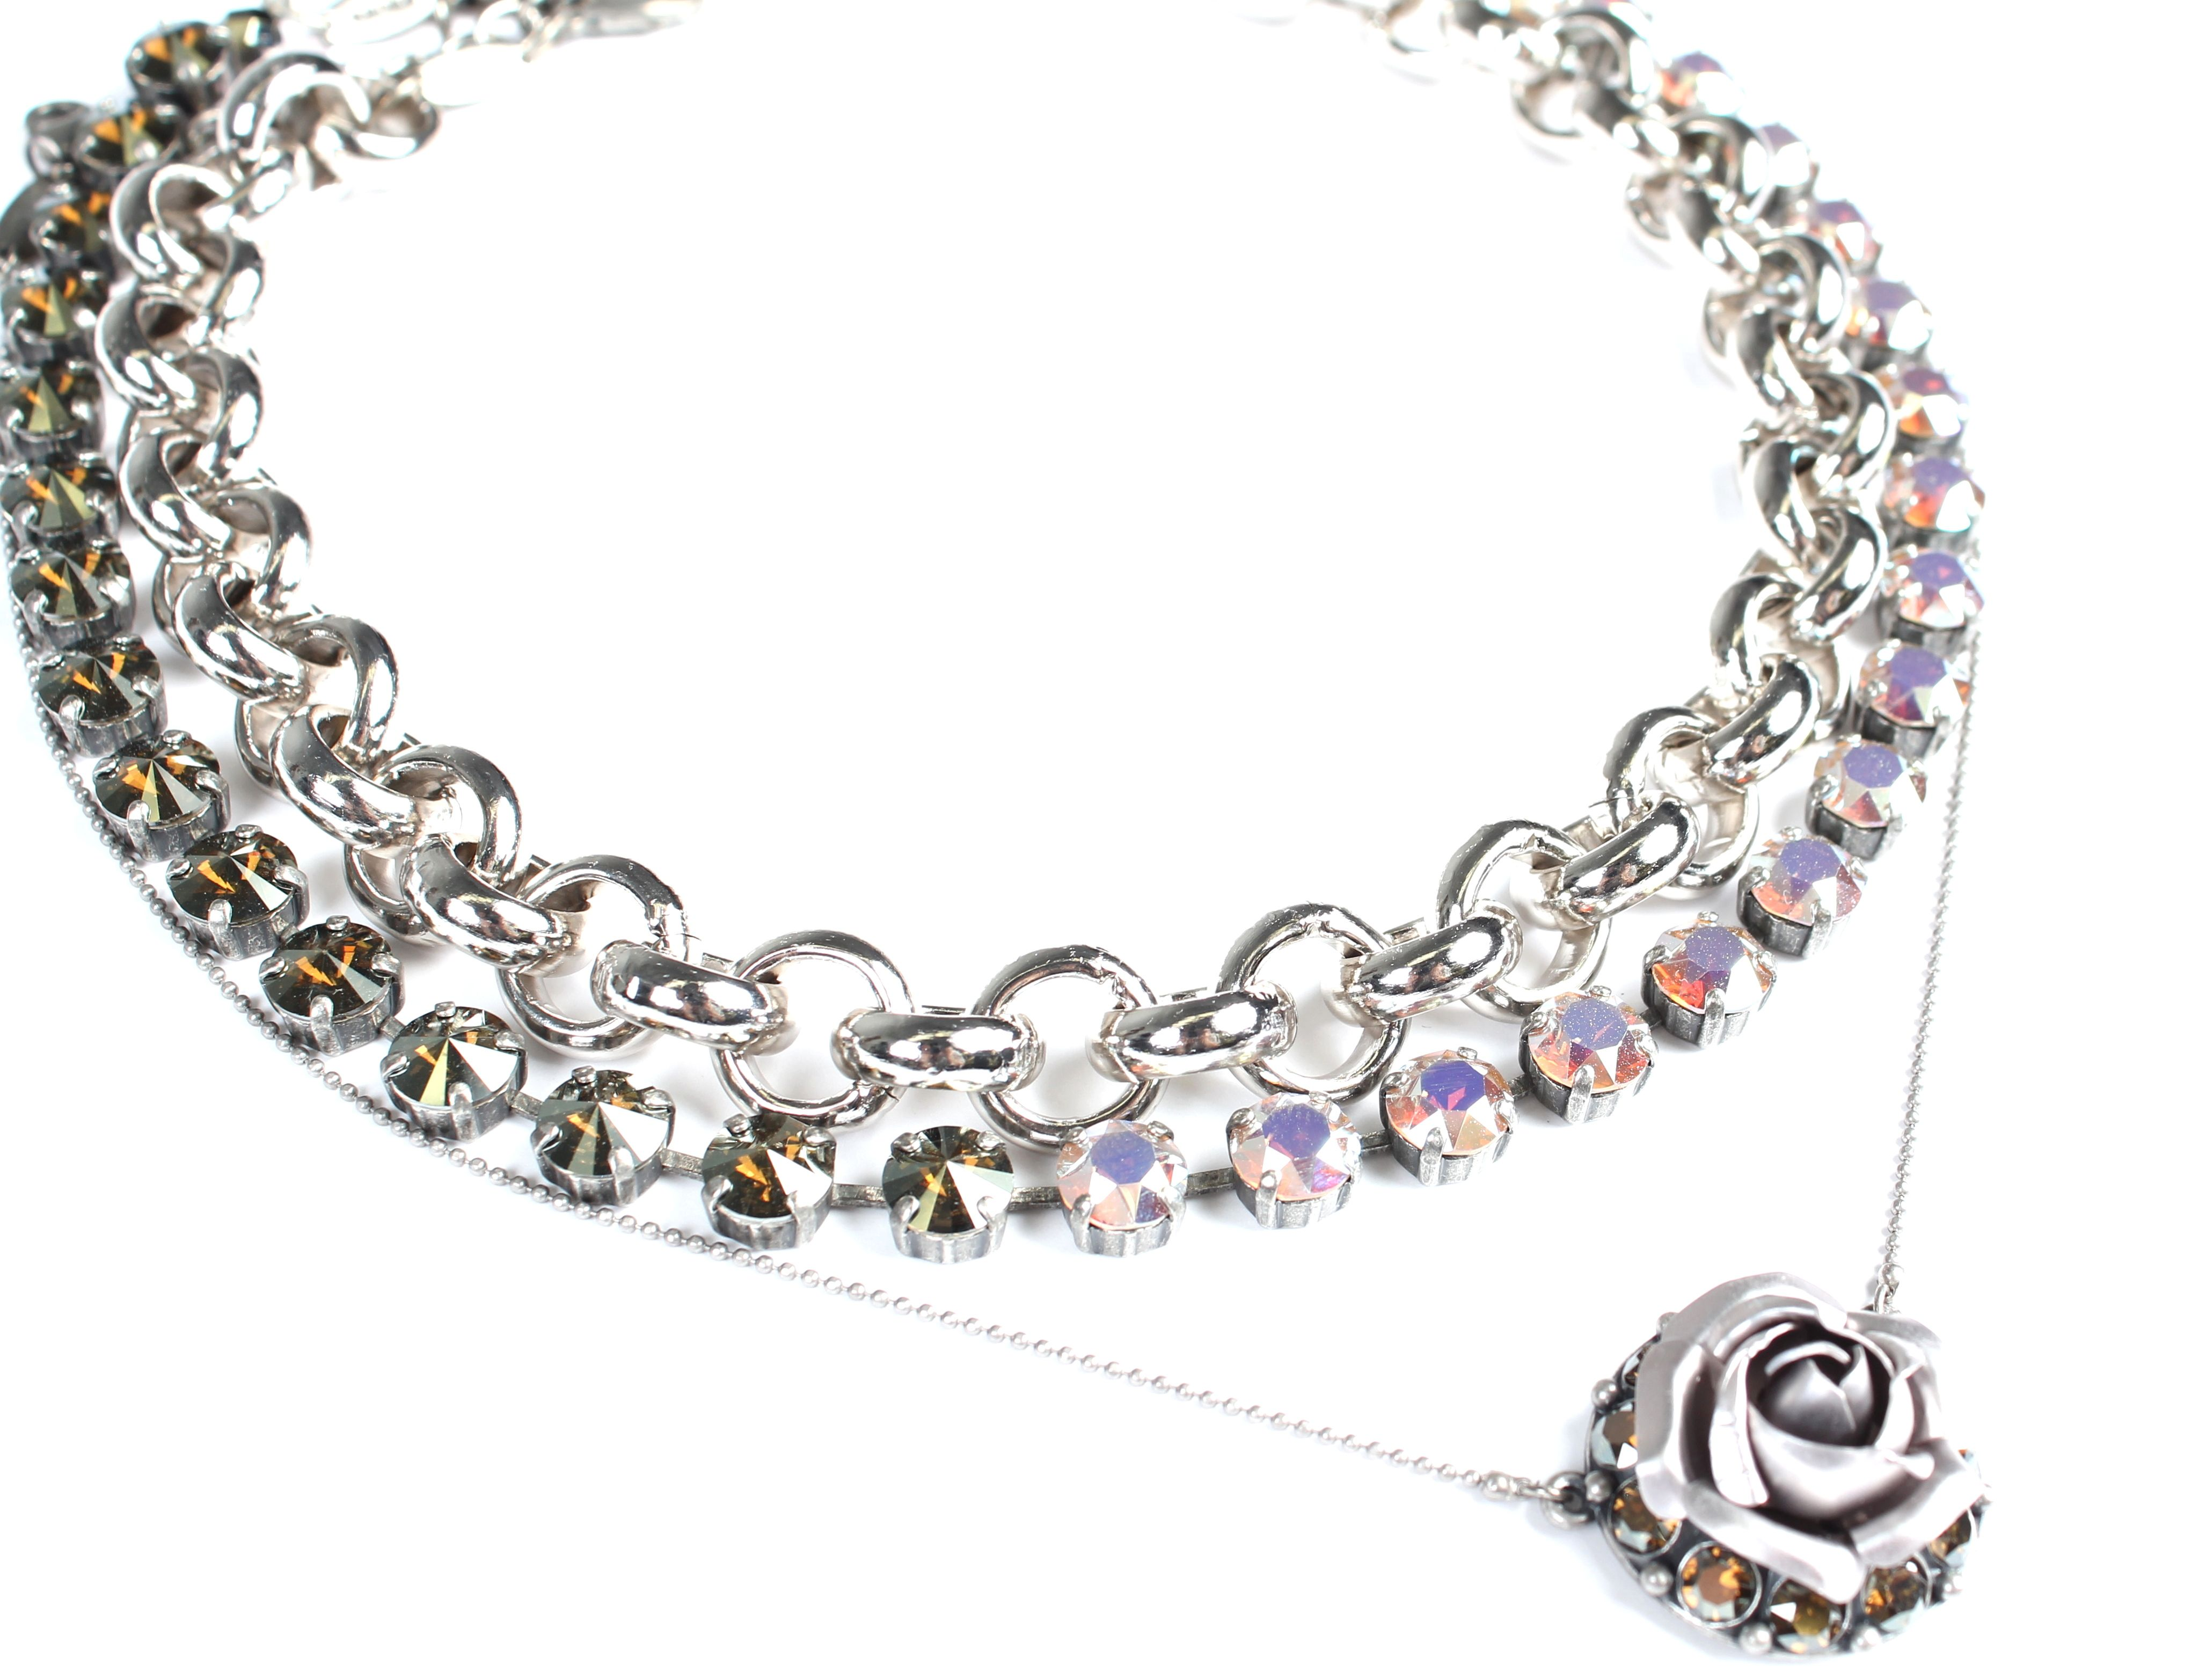 Sabika look necklace - Delicate Sophisticated Look Chic Cool Link Necklace Edition Rococo Sabika Fun Tm Choker